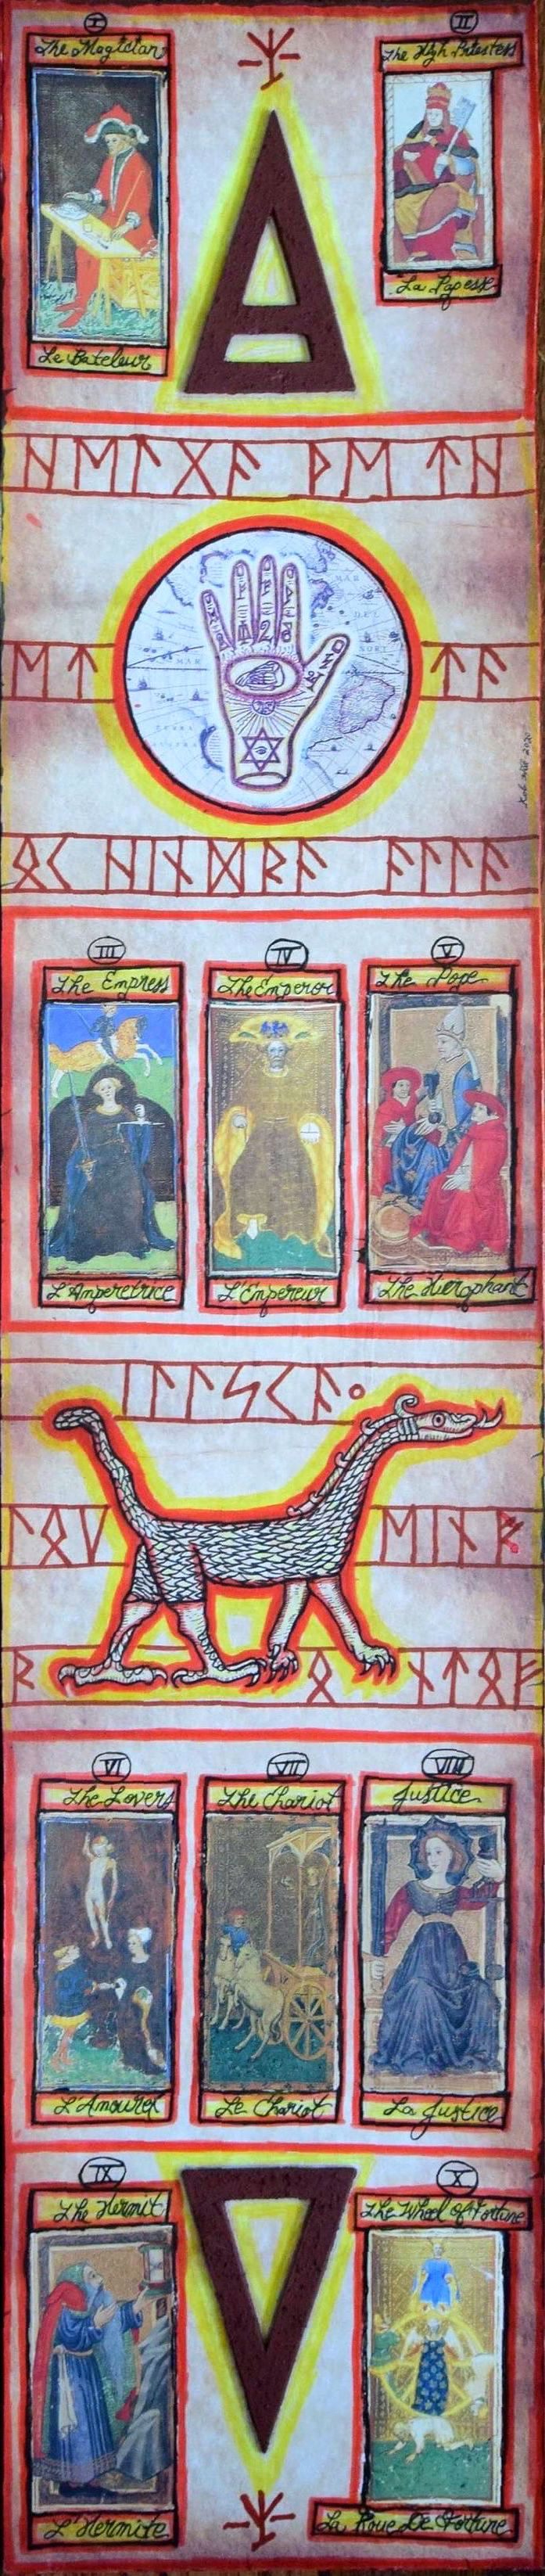 Sacred Scrolls Version 1, 1of 3